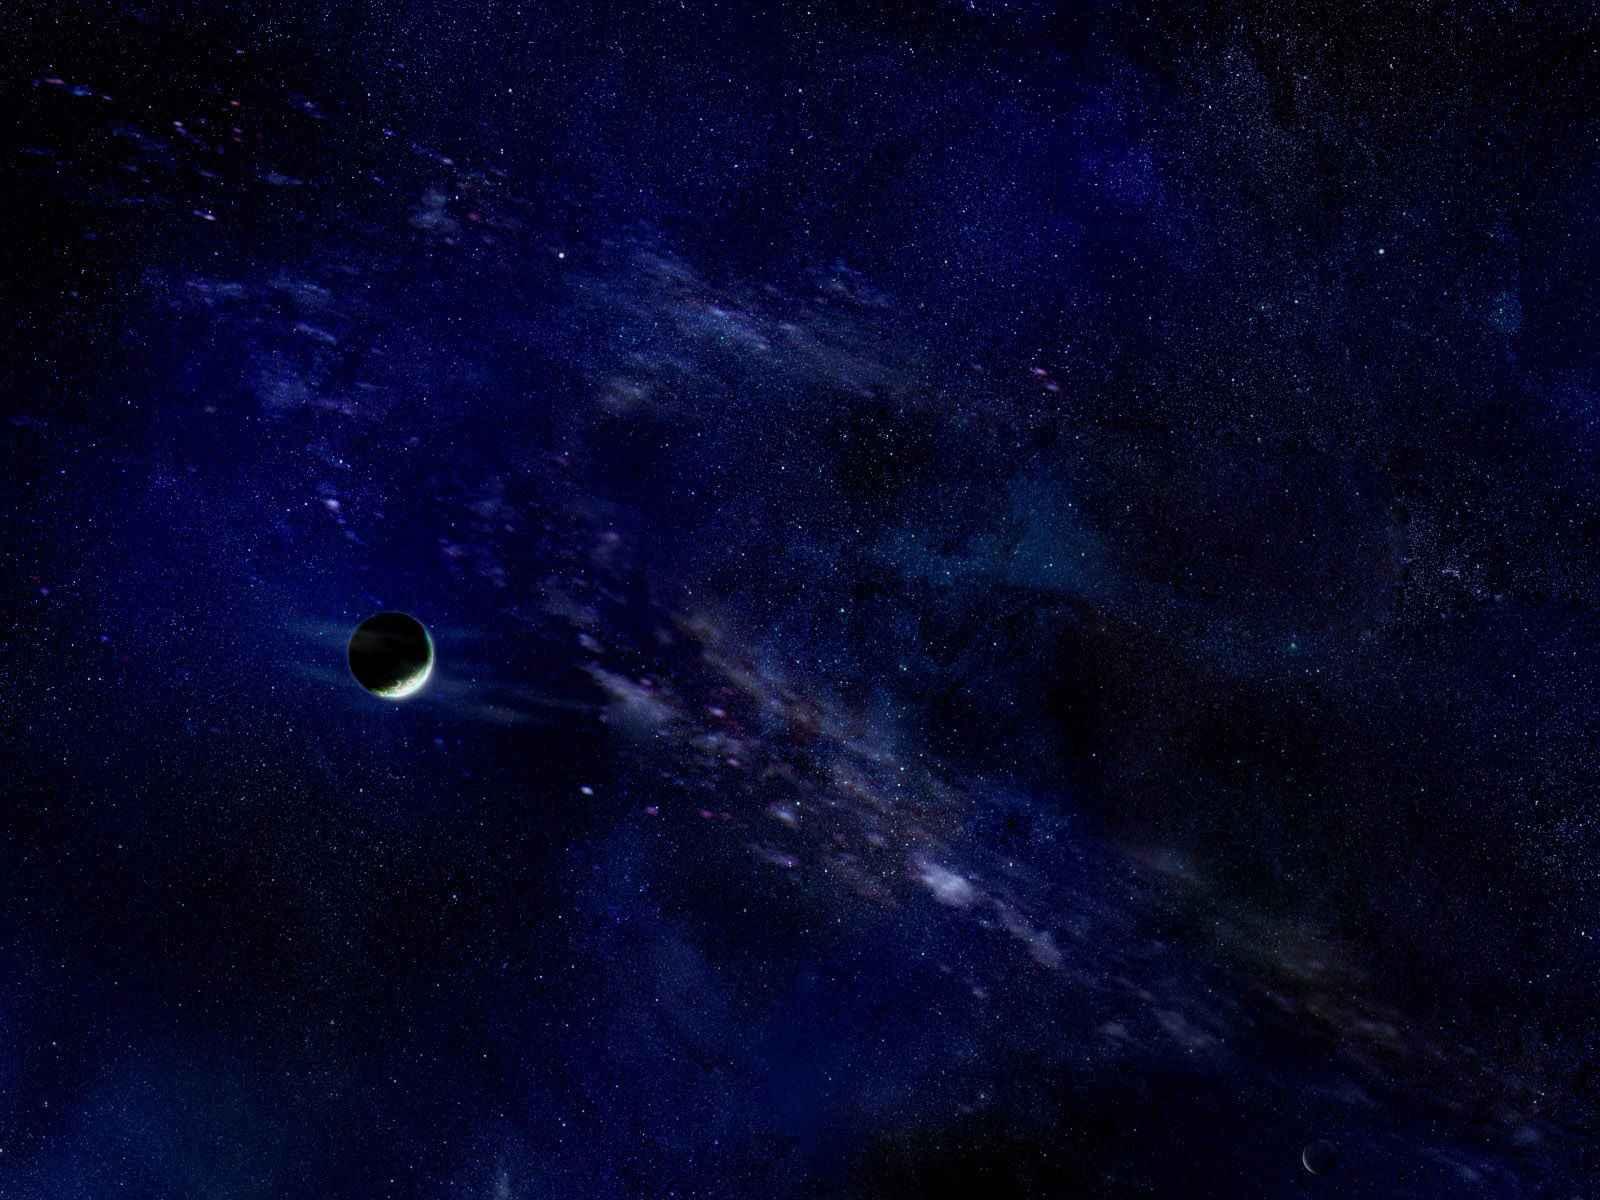 Space Wallpaper 039